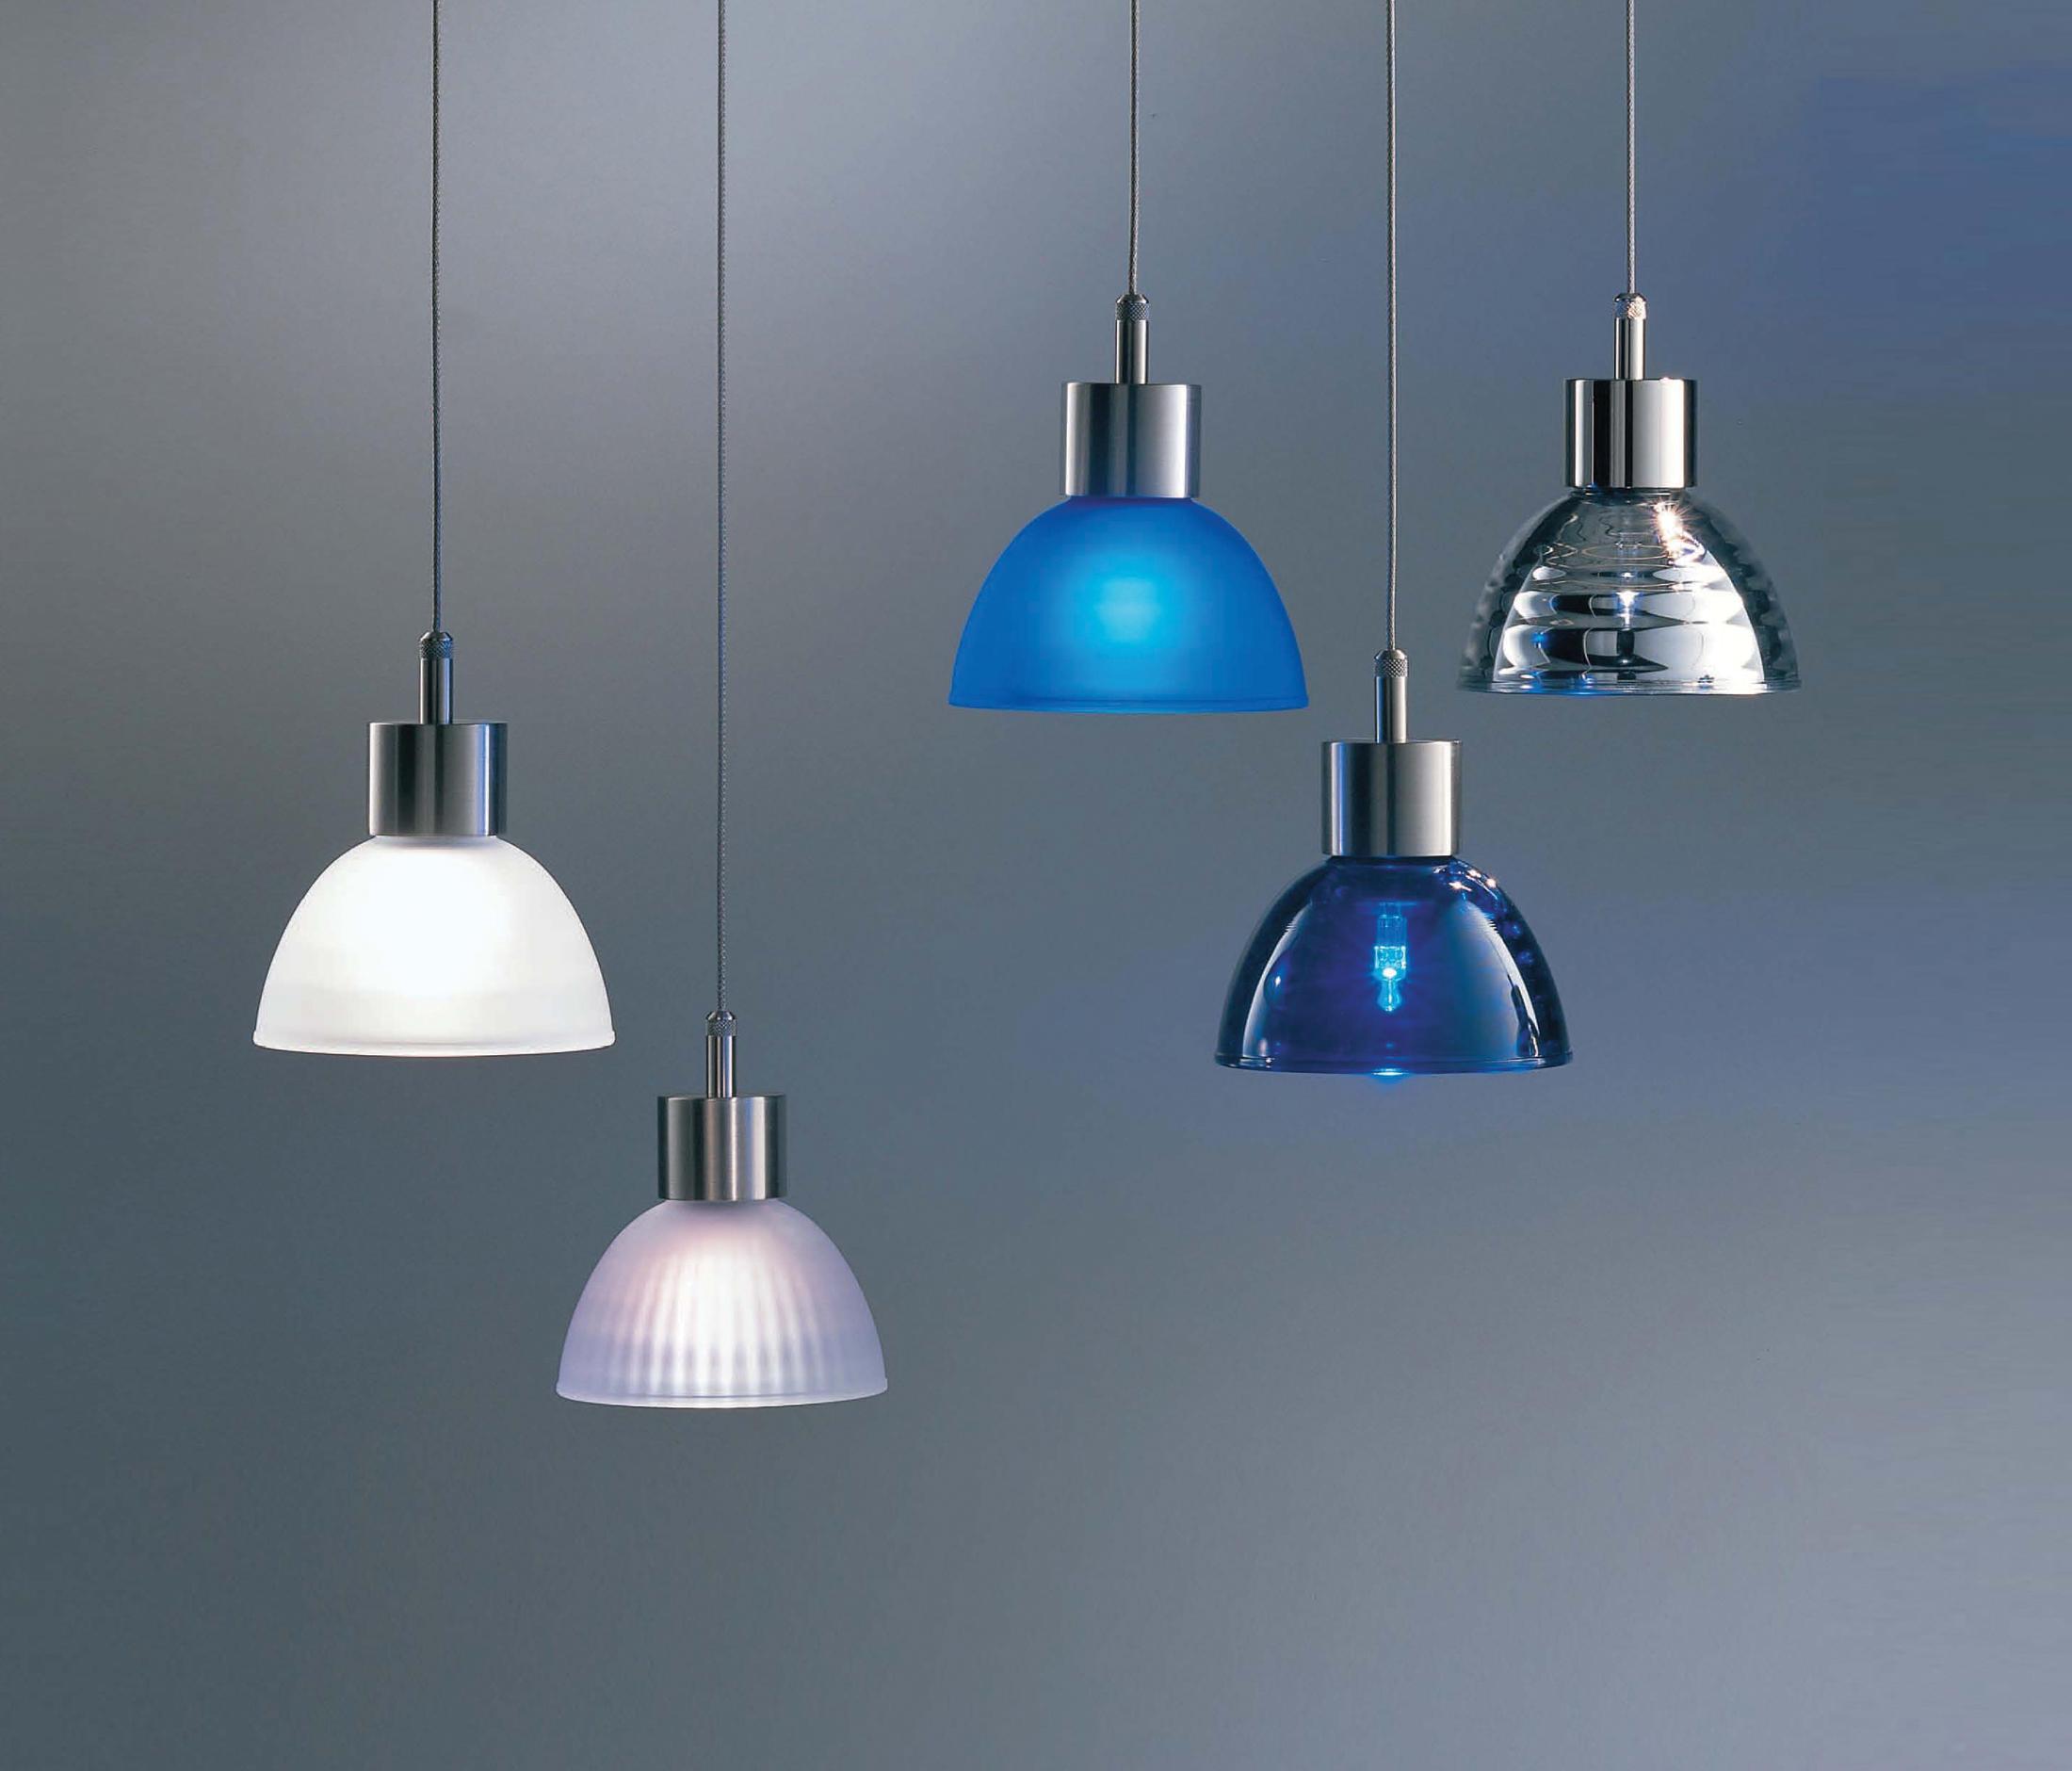 Steng Licht pino pendant lights general lighting from steng licht architonic